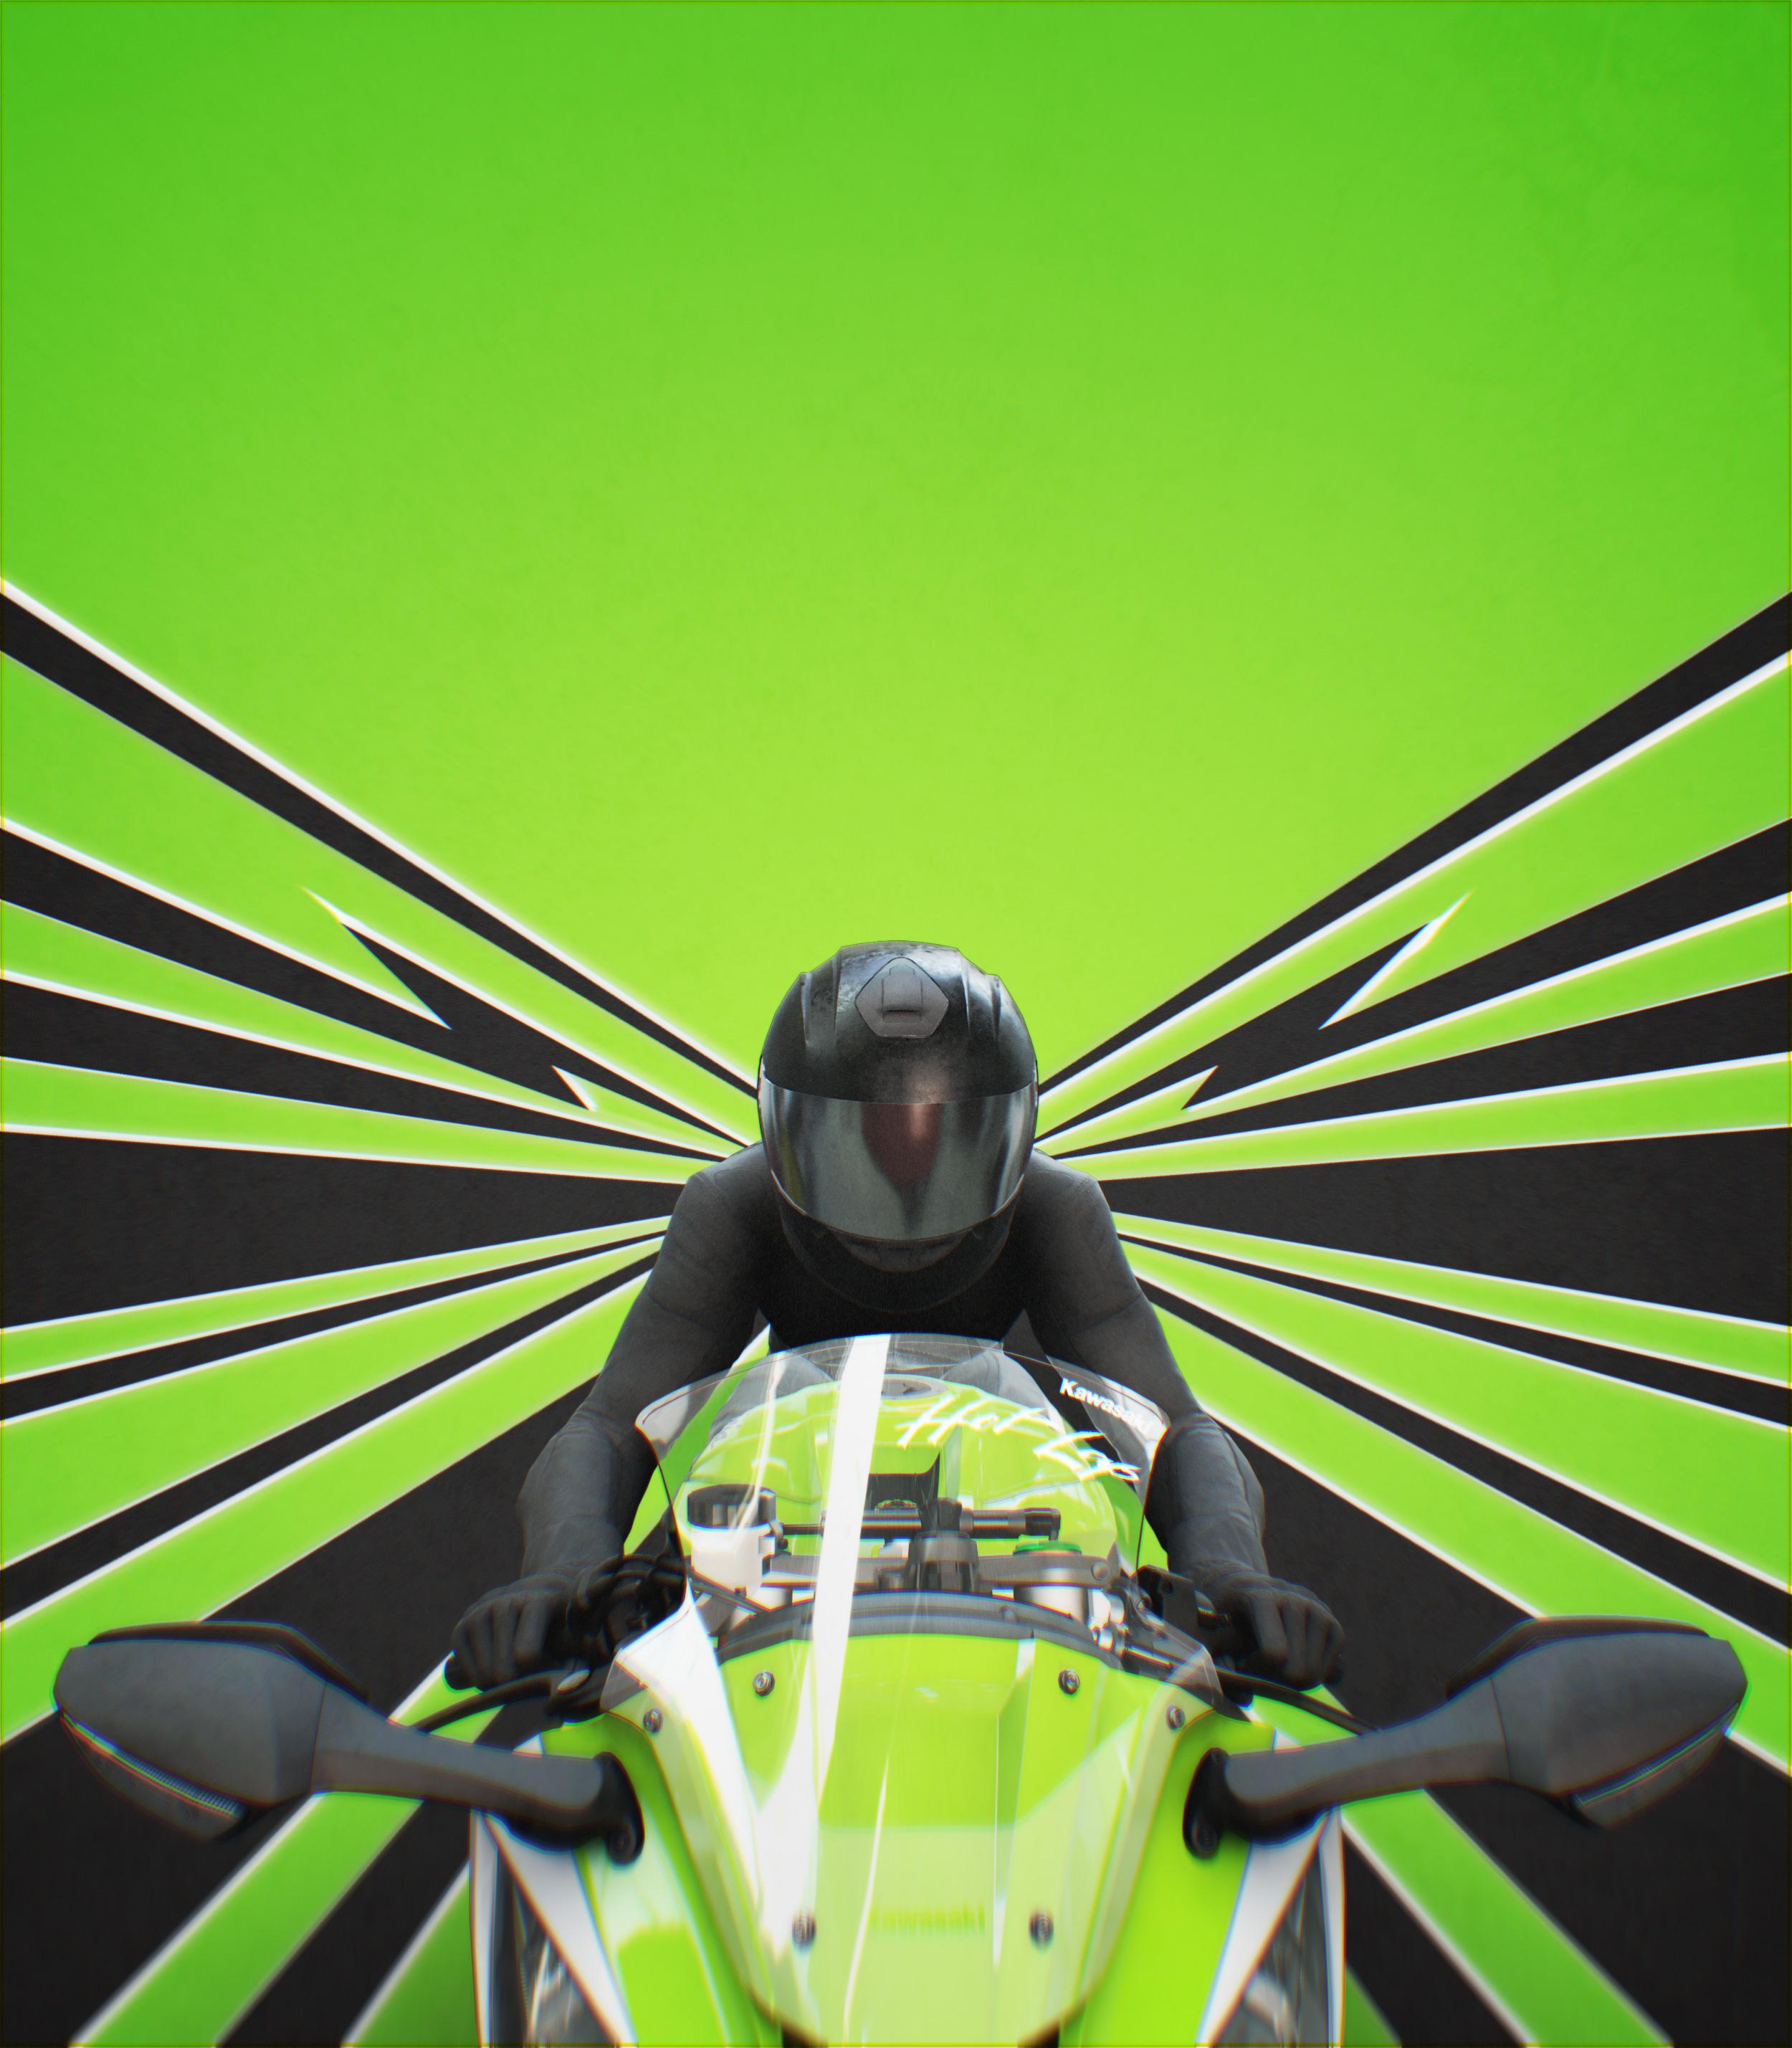 09_Kawasaki_ninja.jpg